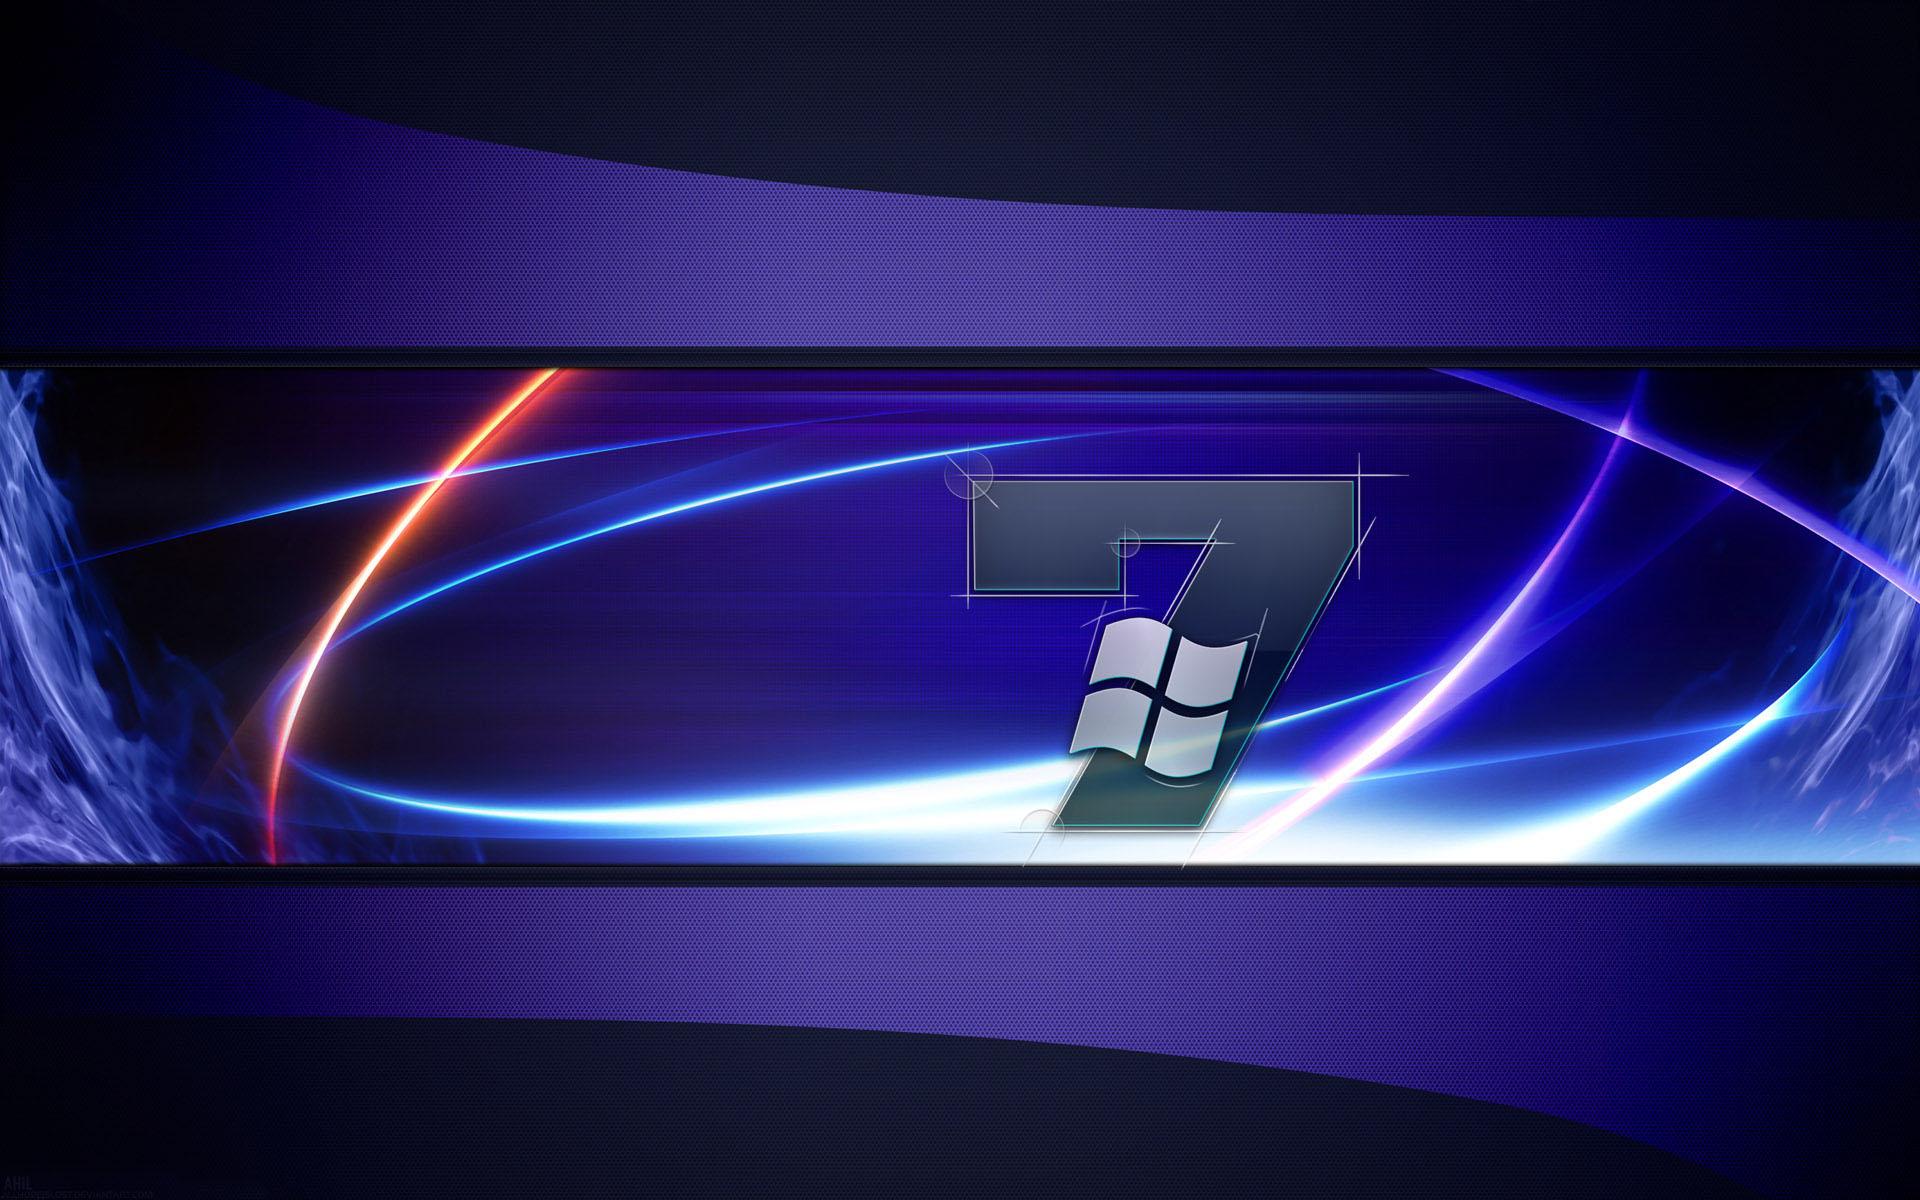 Wallpapers Windows 7 HDTV 1080p 10 Wallpapers de Tecnologia 1920x1200